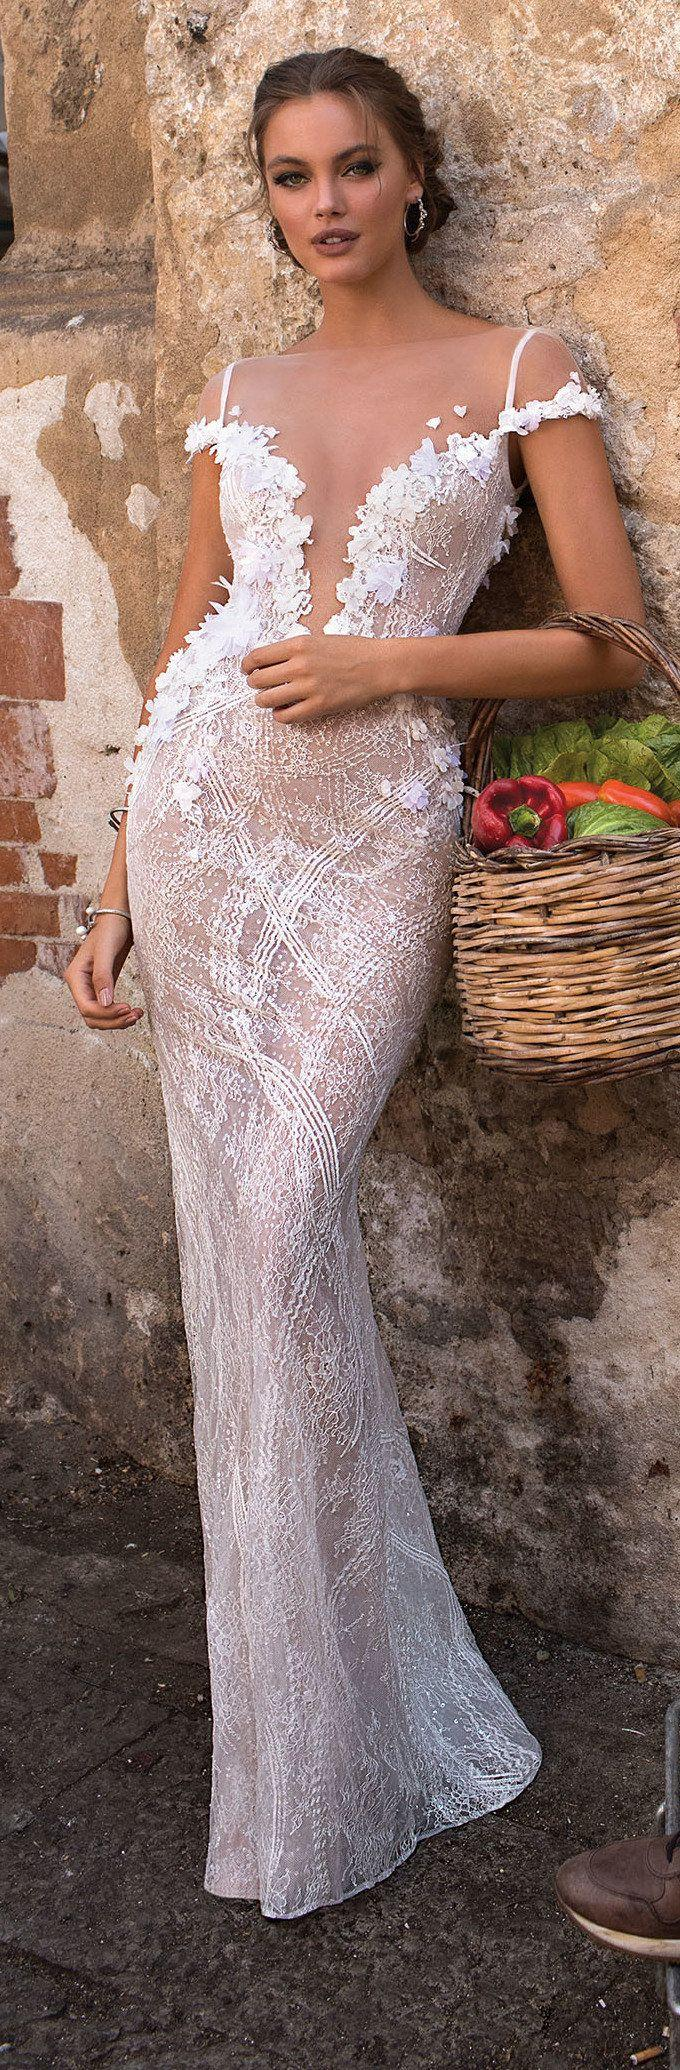 Свадьба - MUSE By Berta : Sicily Wedding Dress Collection